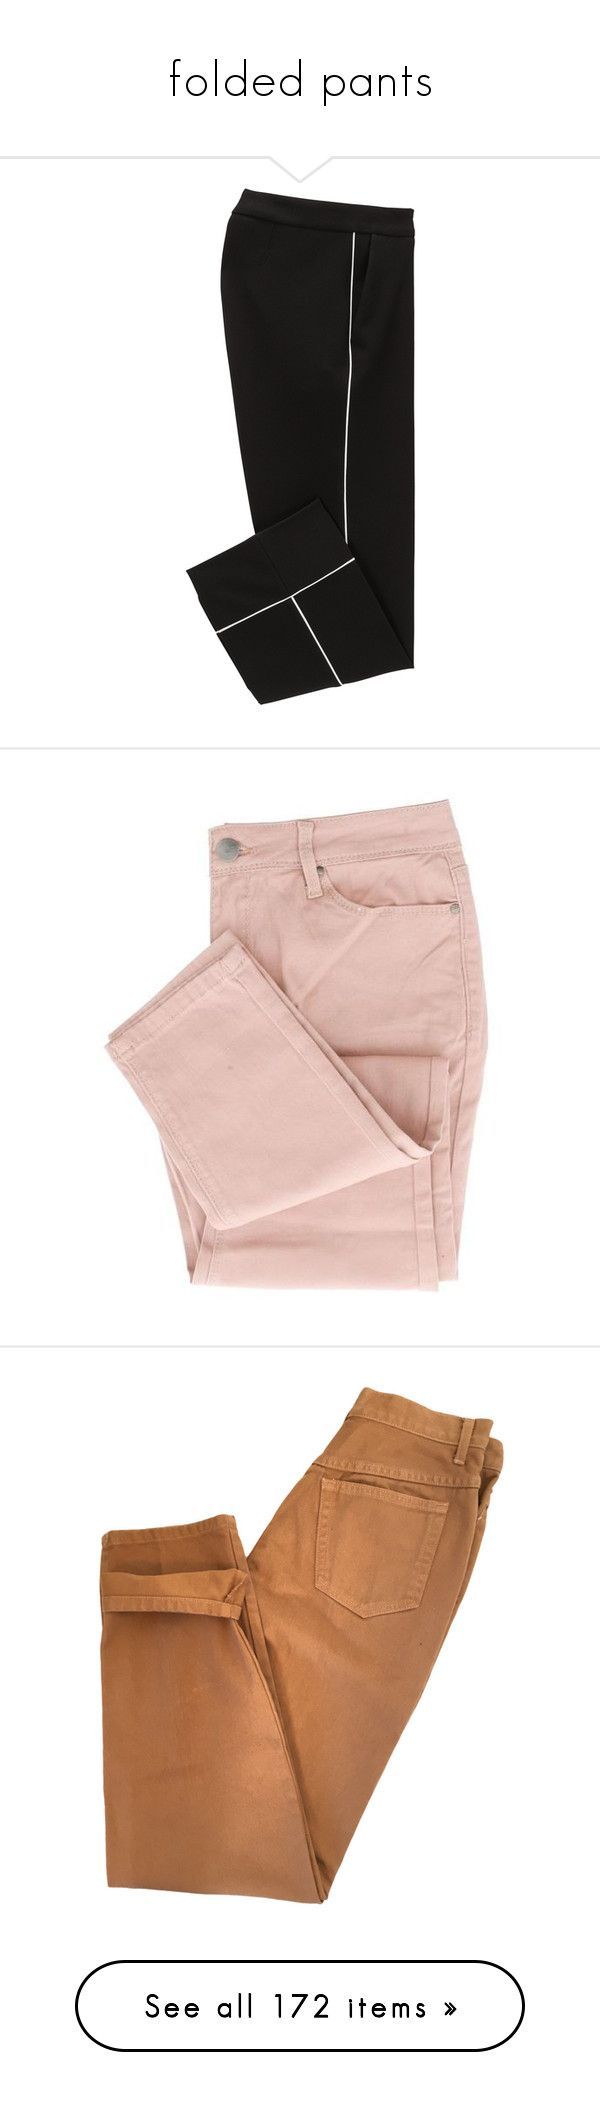 """folded pants"" by jennifertrimble ❤ liked on Polyvore featuring pants, capris, cropped capri pants, cropped pants, crop length pants, cropped trousers, jeans, bottoms, pantalones and slim fit jeans"